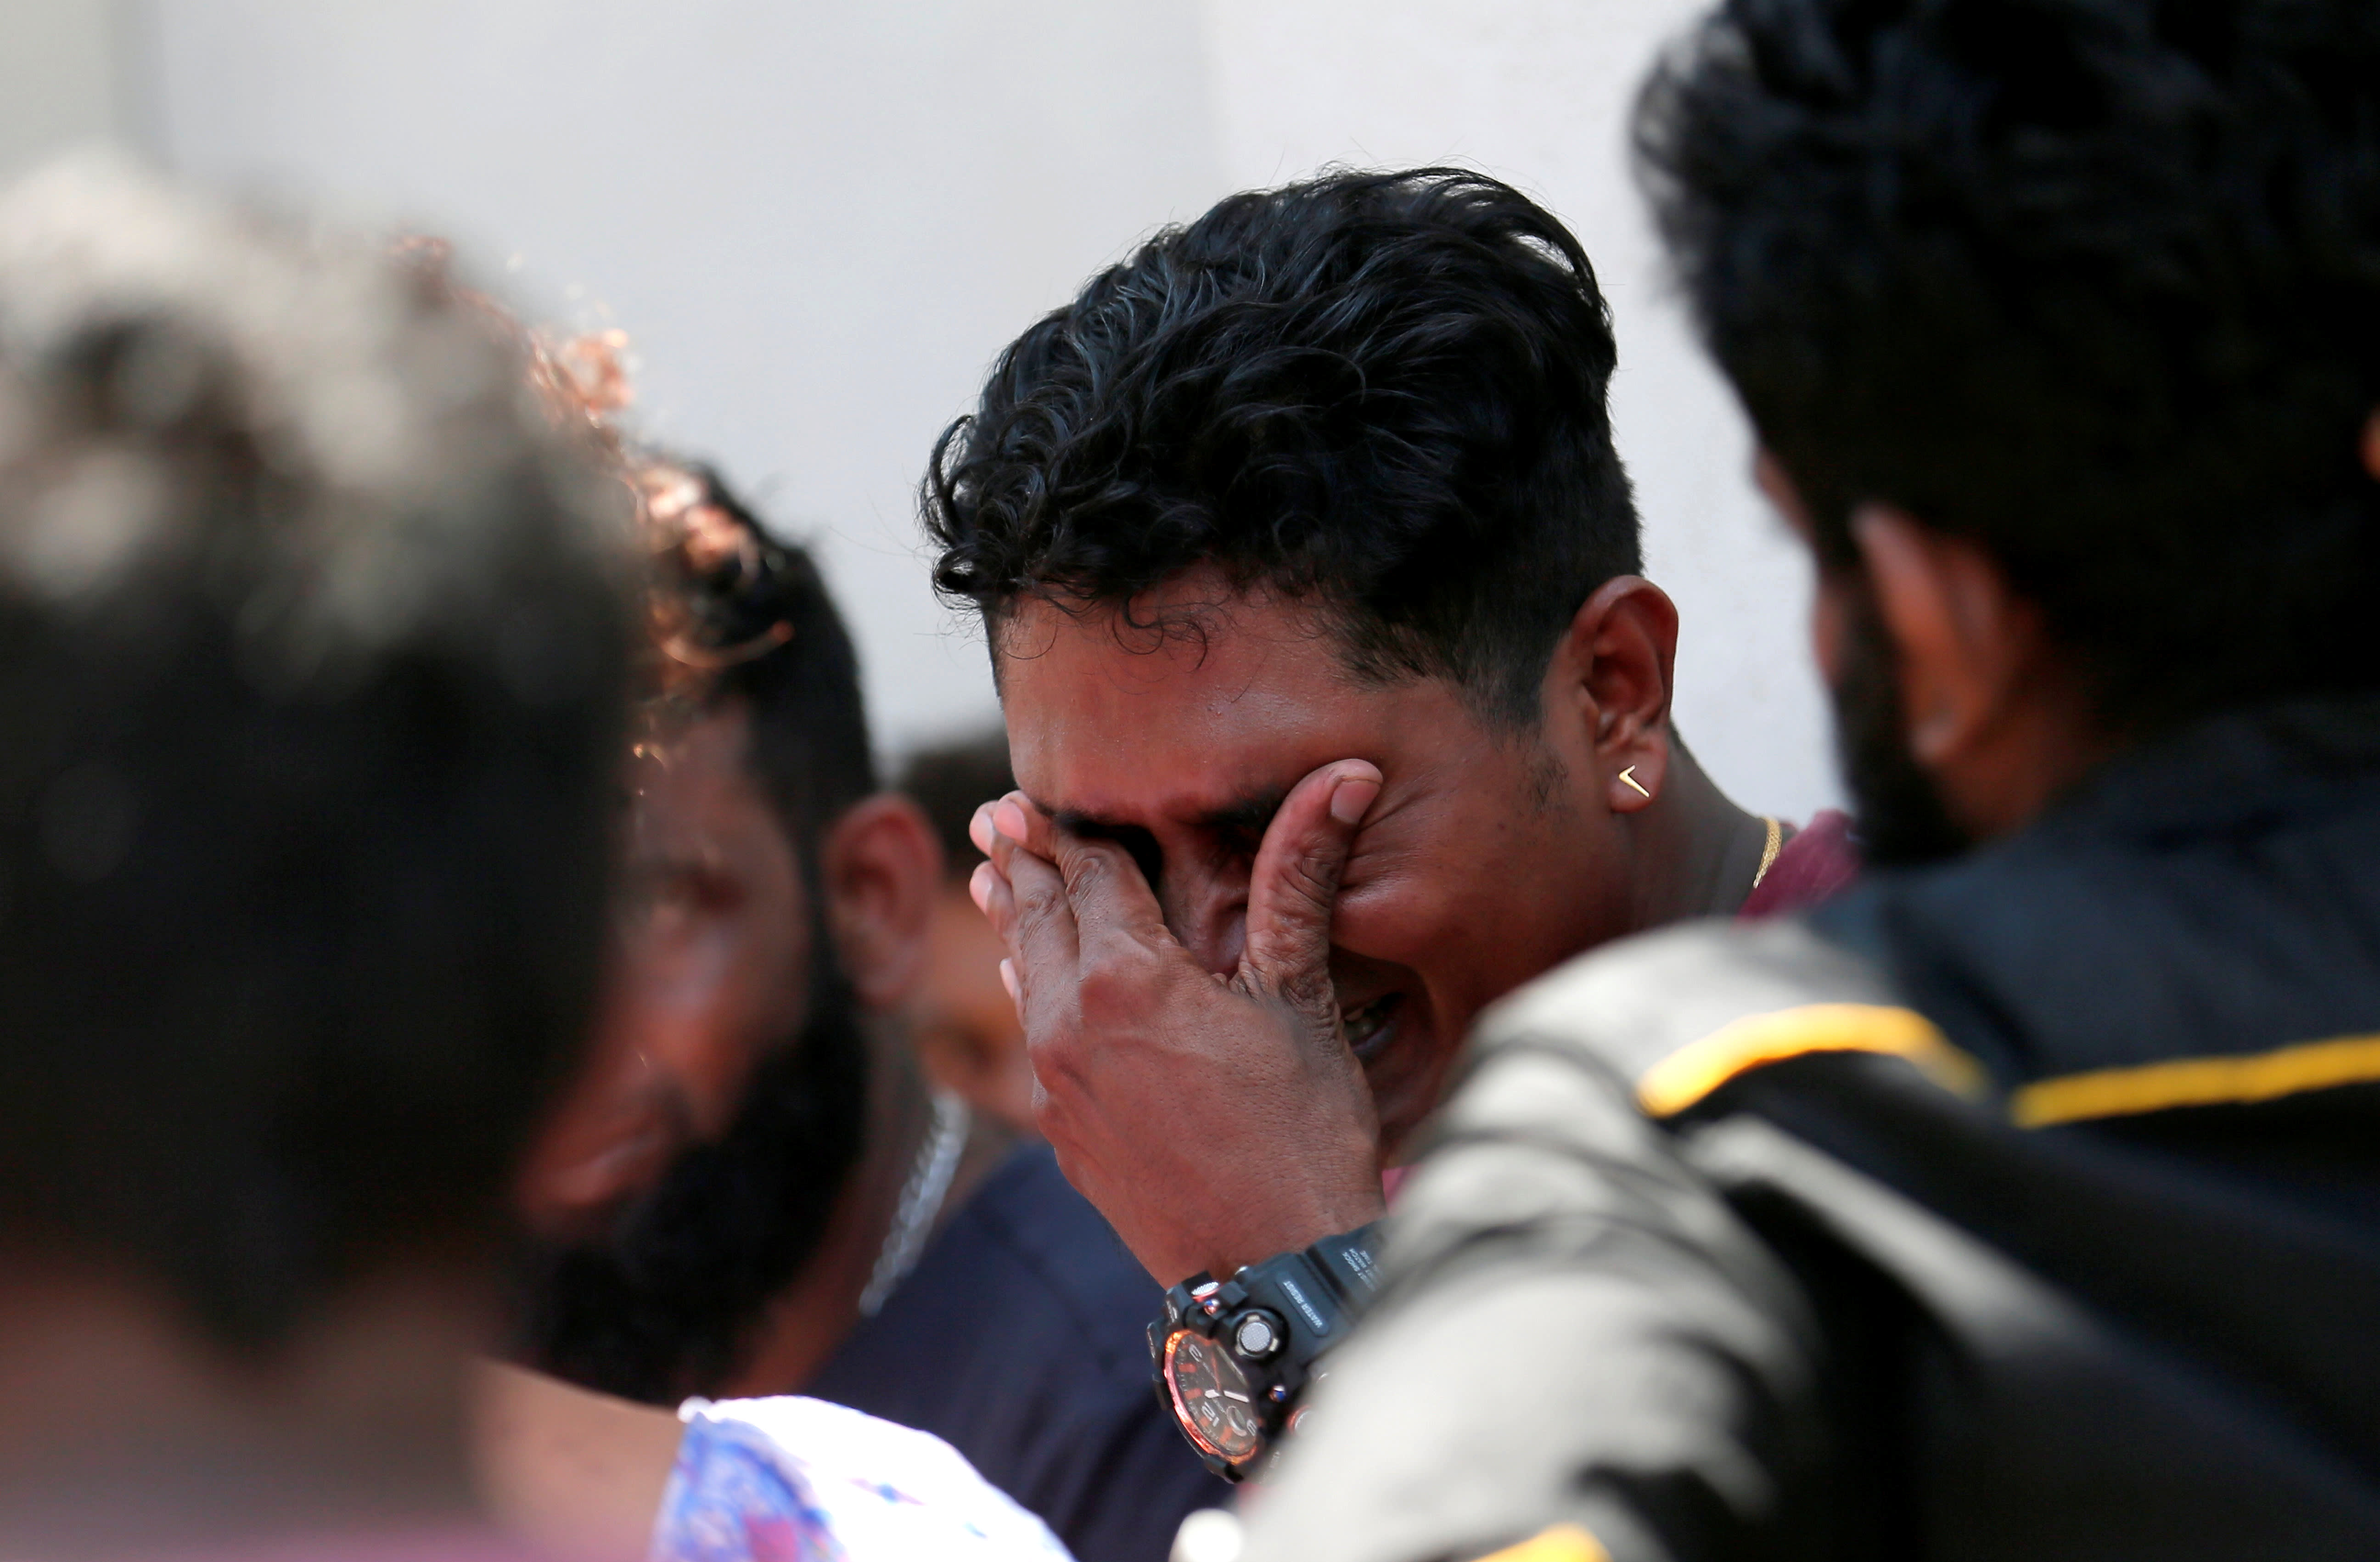 US citizens killed in Sri Lanka Easter attacks, secretary of State Pompeo says